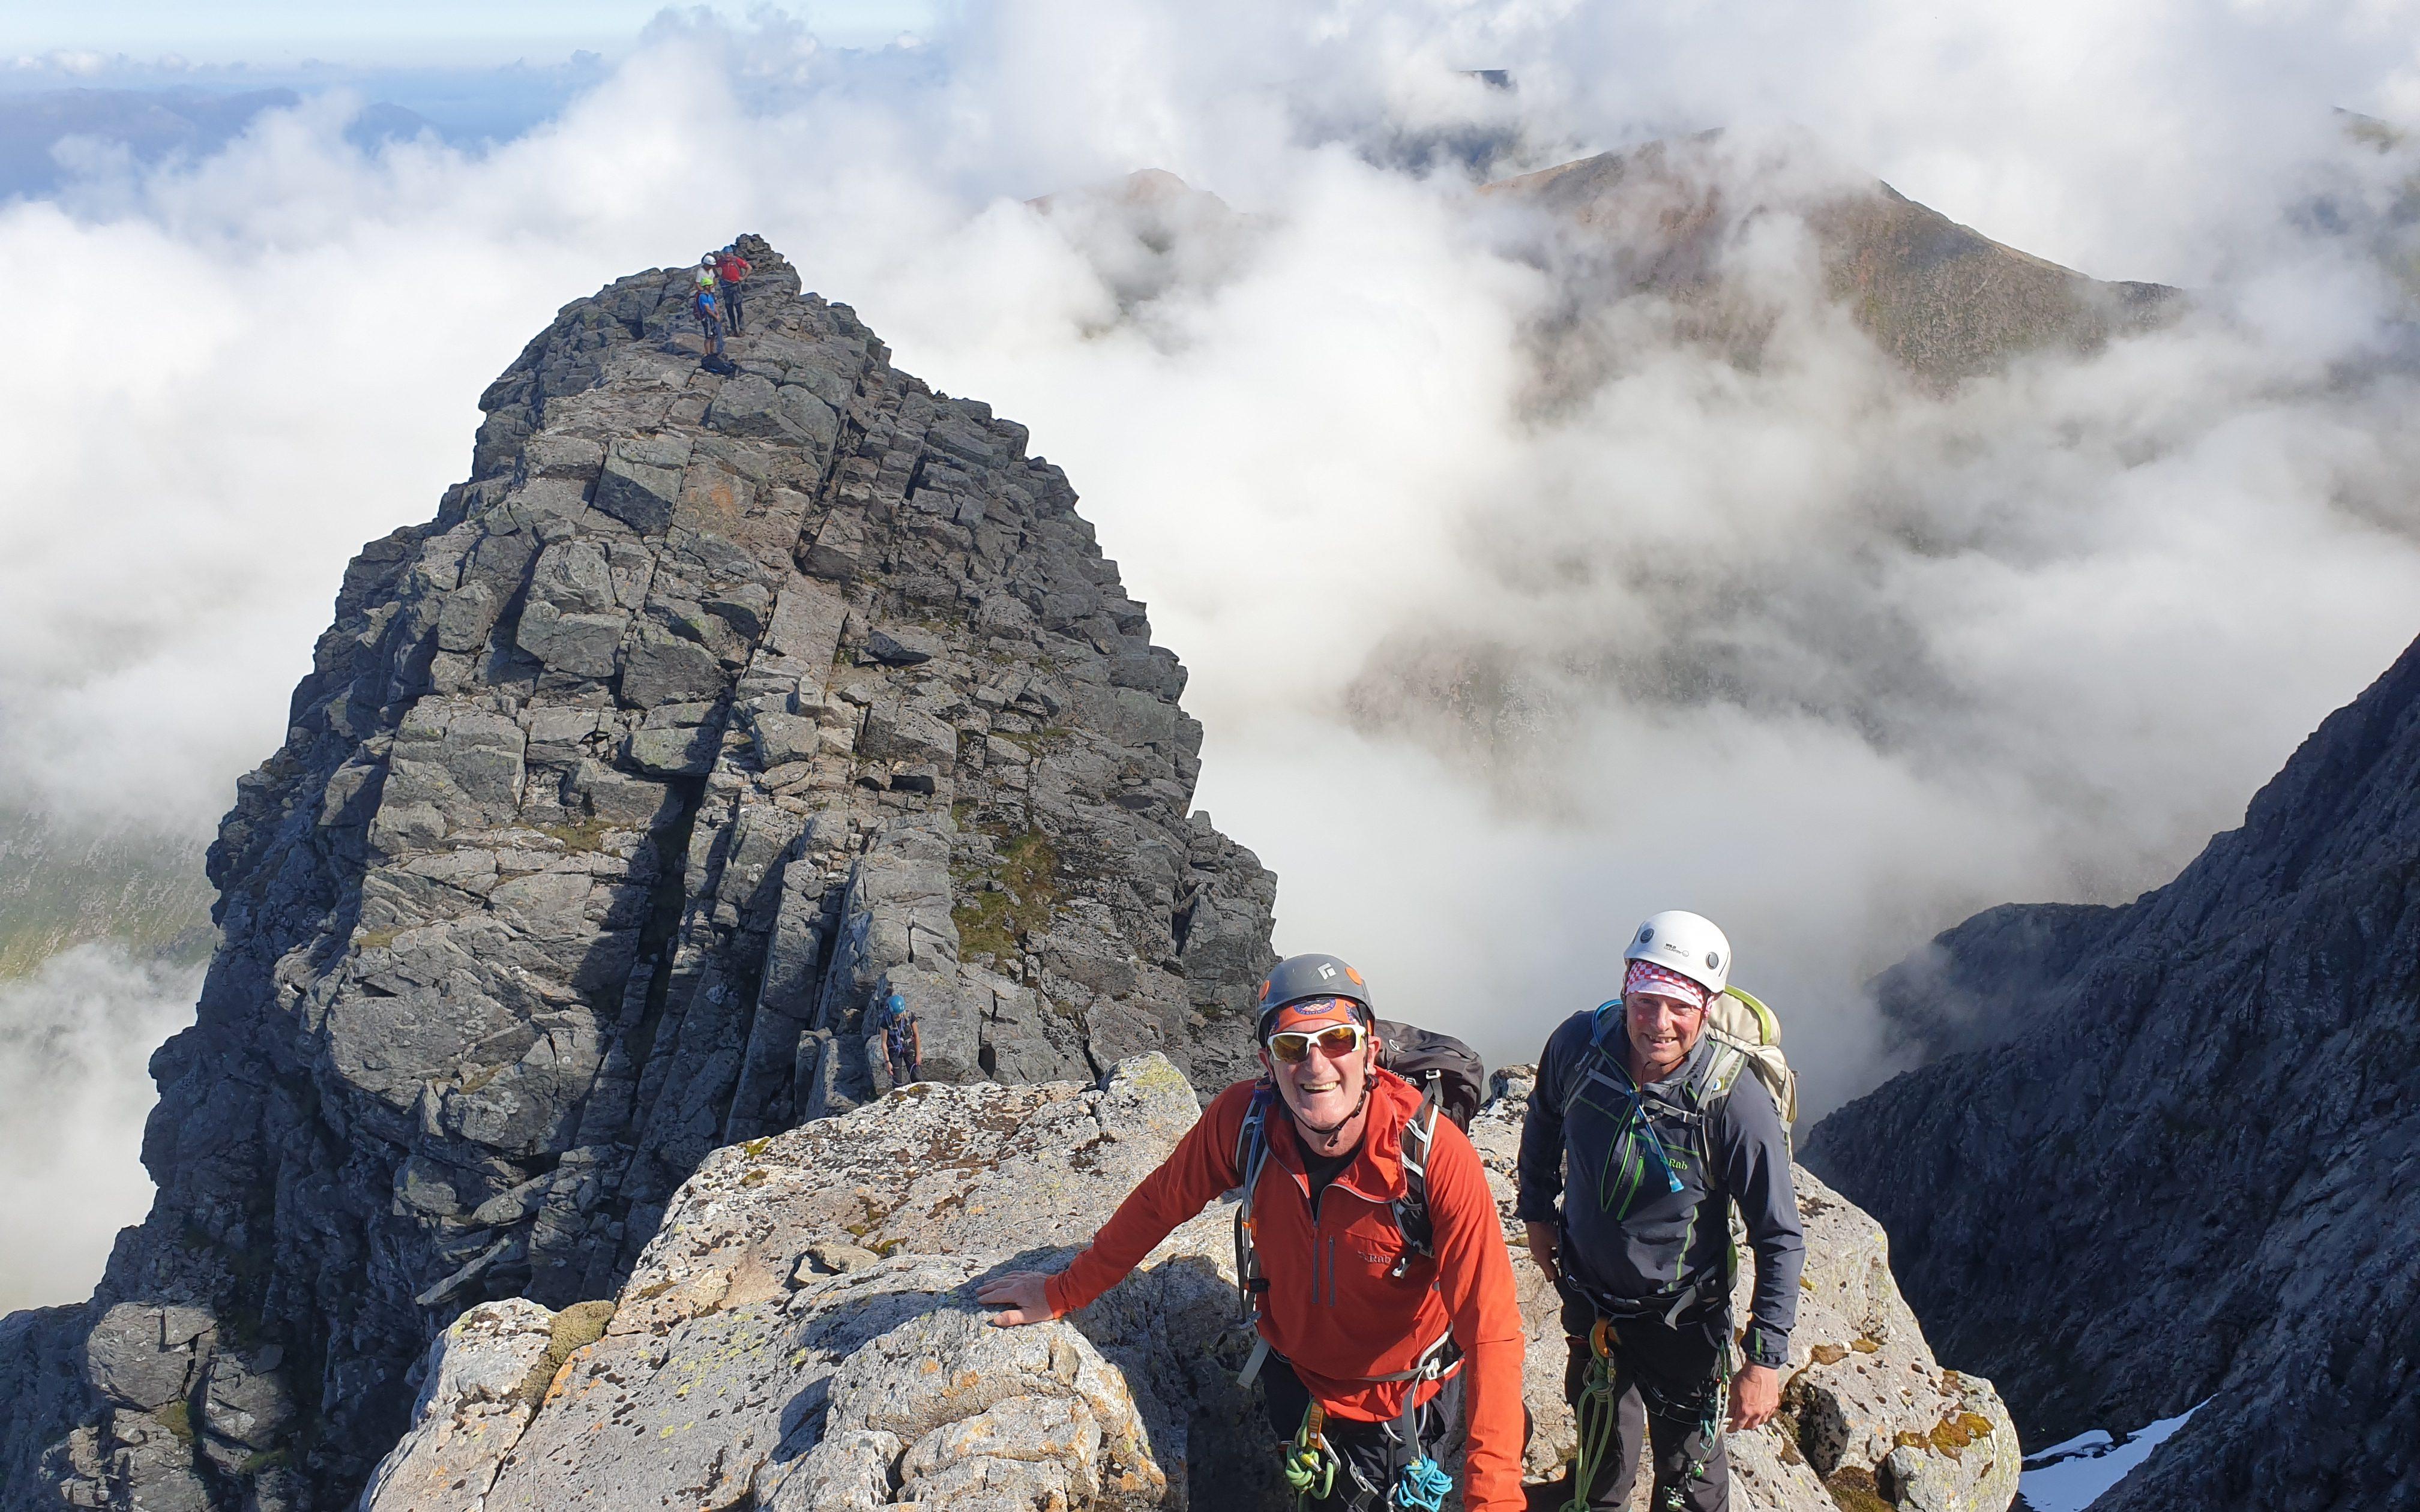 Tower Ridge, Ben Nevis, Tower idge Guide, Tower Ridge Mountain Guide